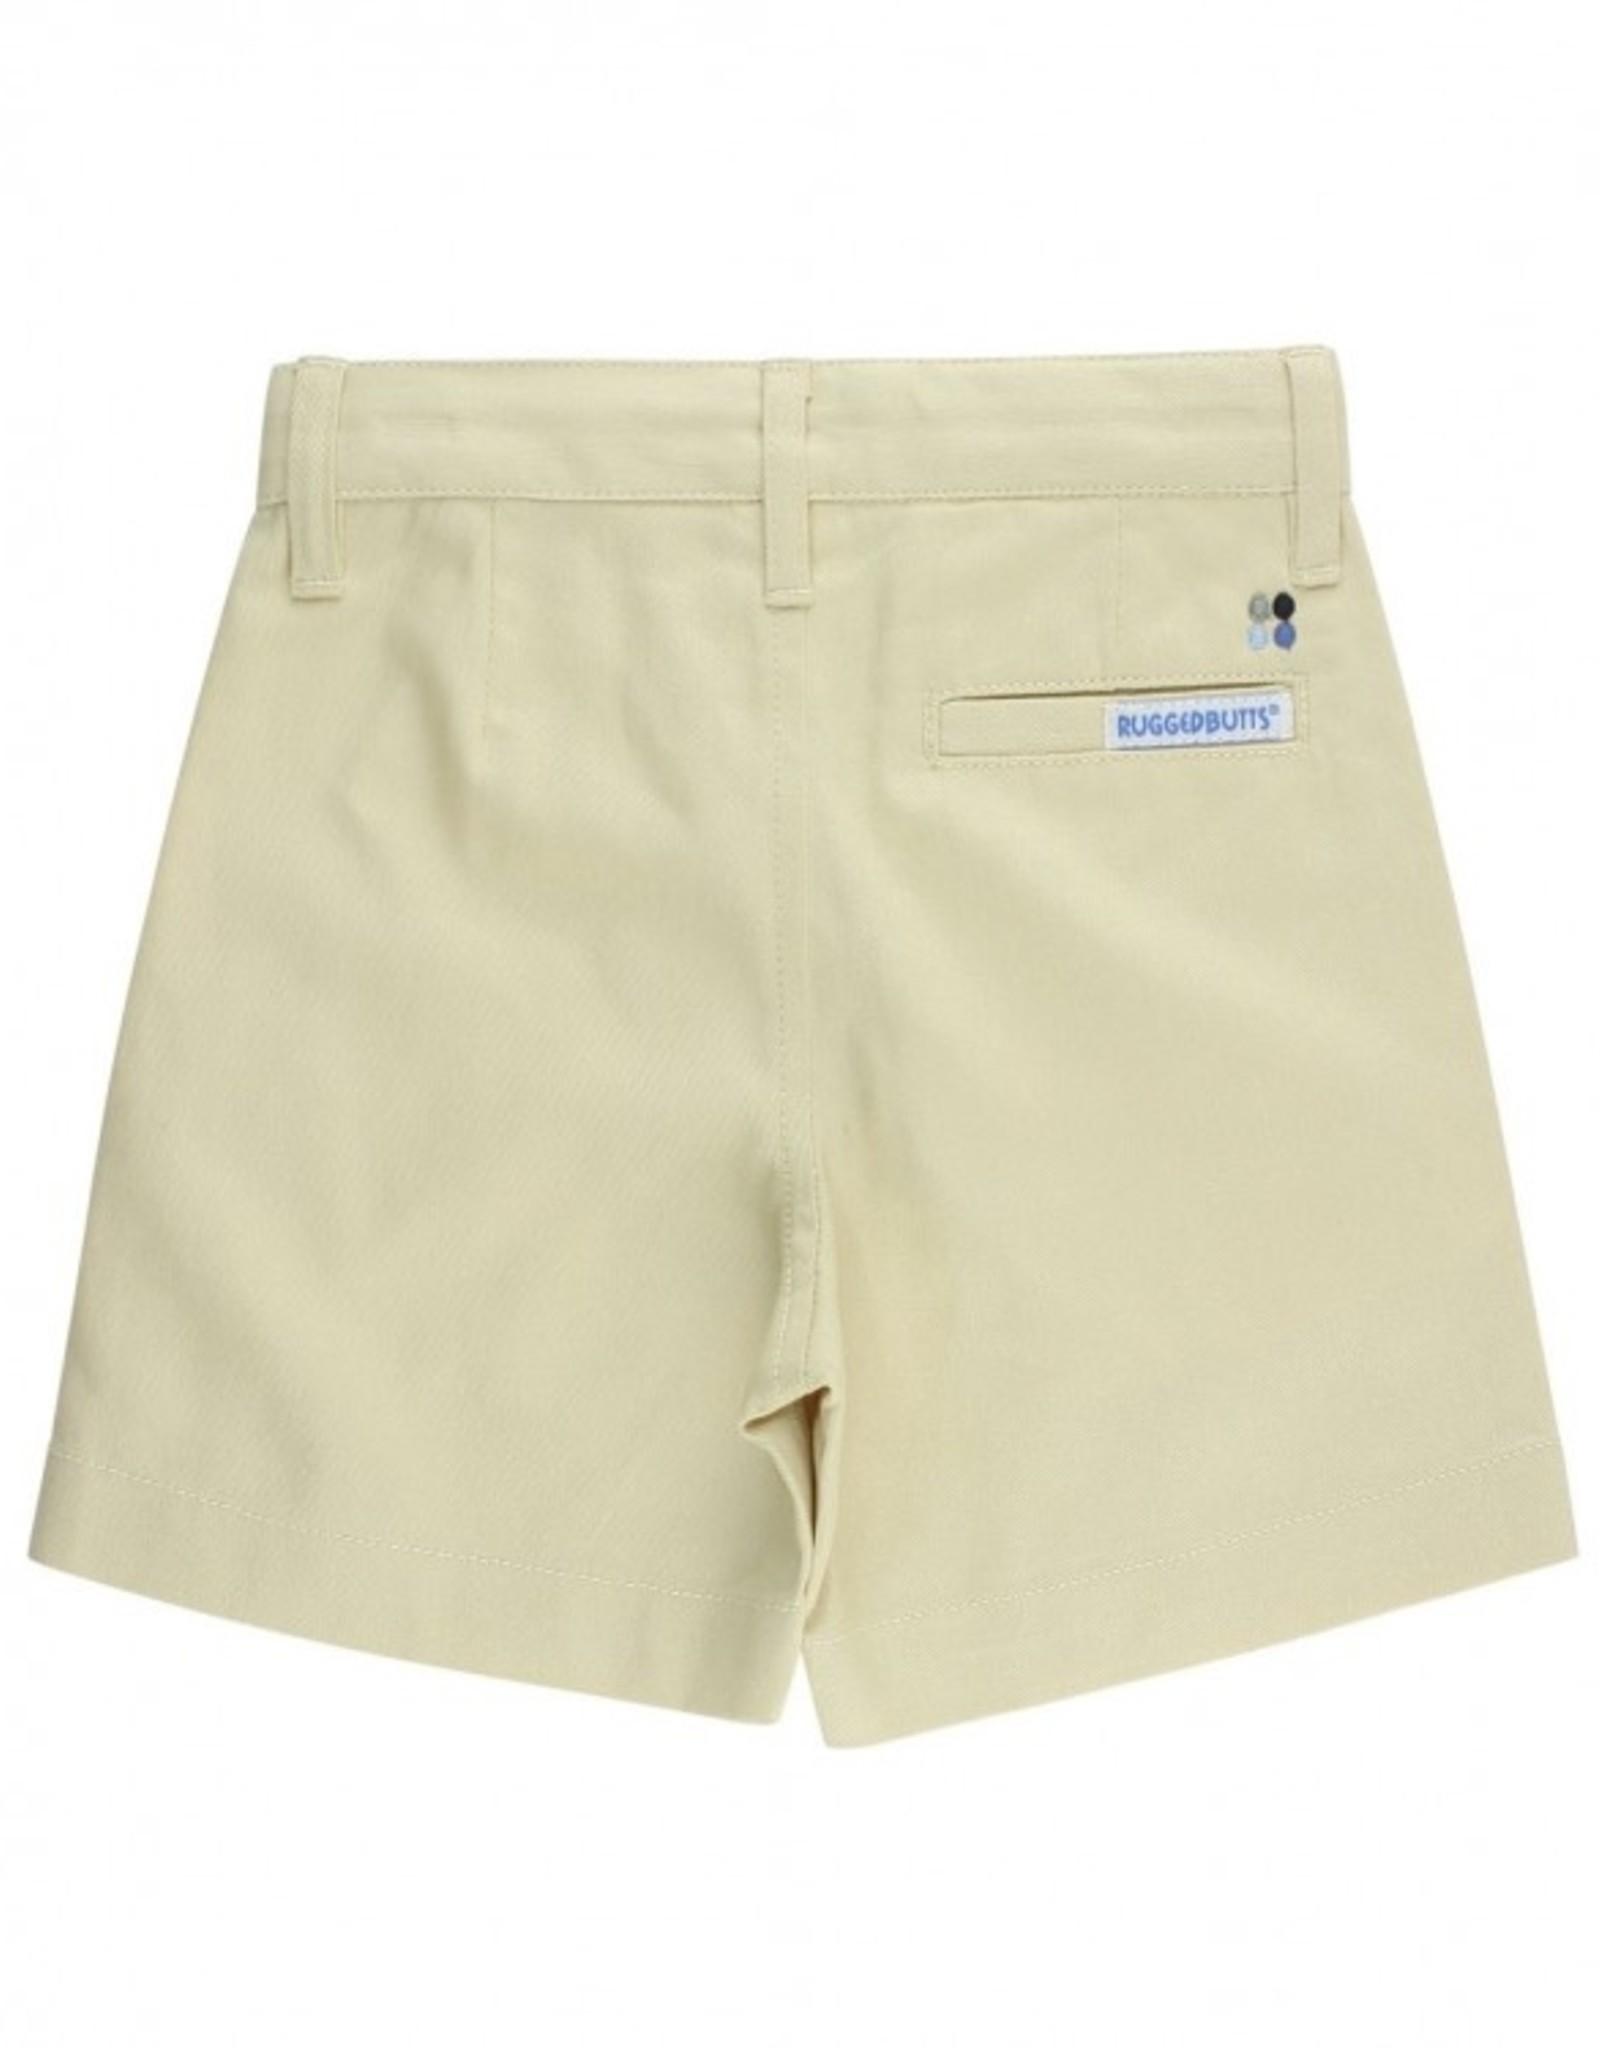 RuggedButts Khaki Lightweight Chino Shorts